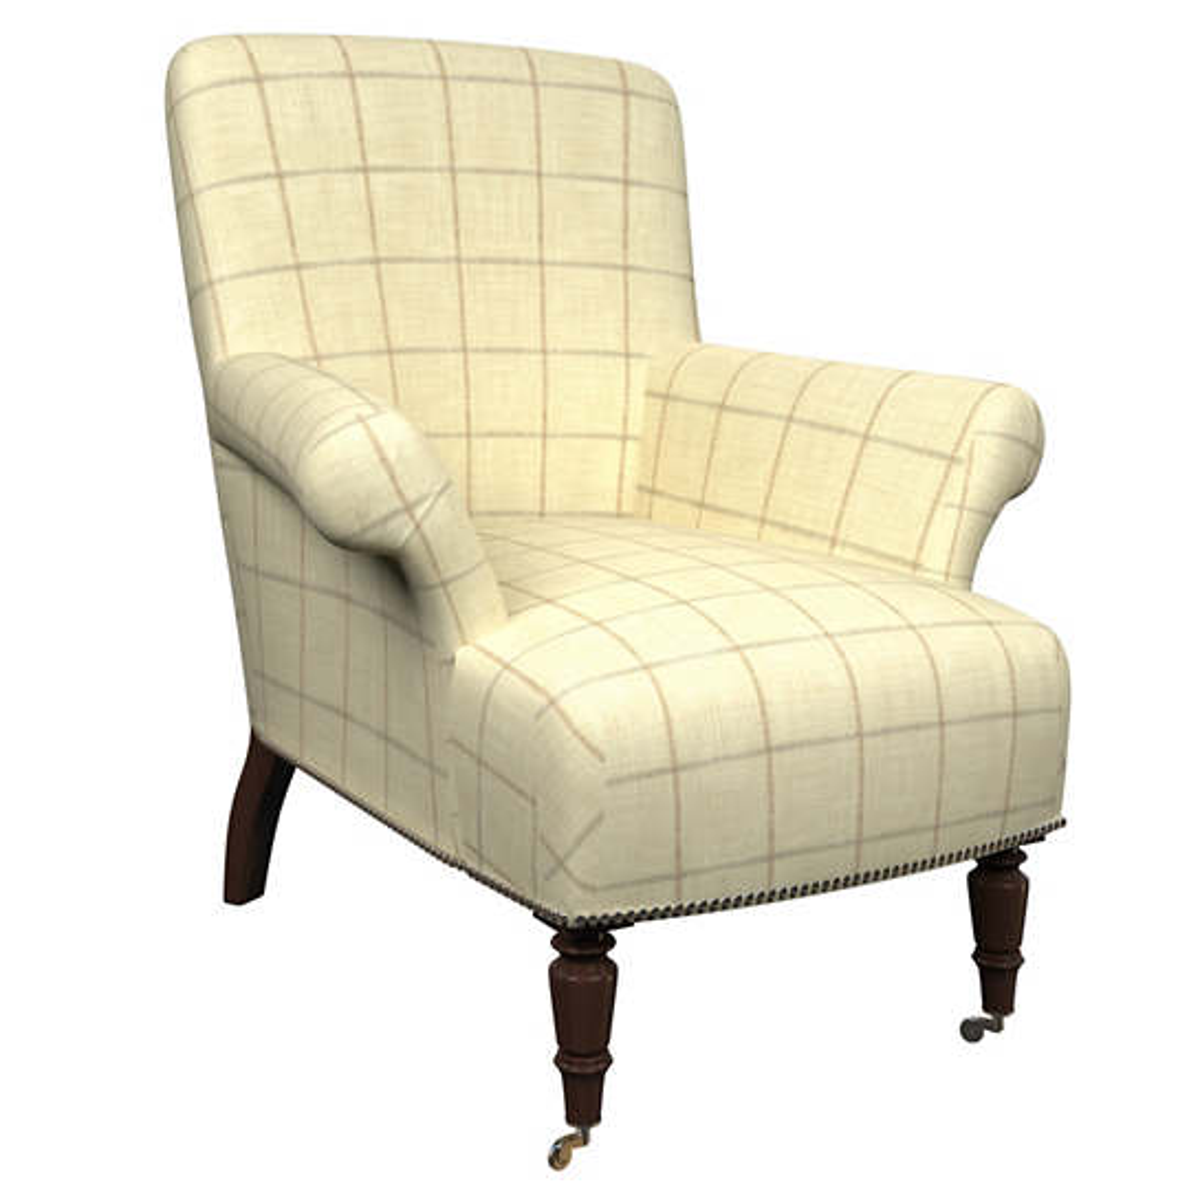 Chatham Tattersall Natural/Grey Barrington Chair